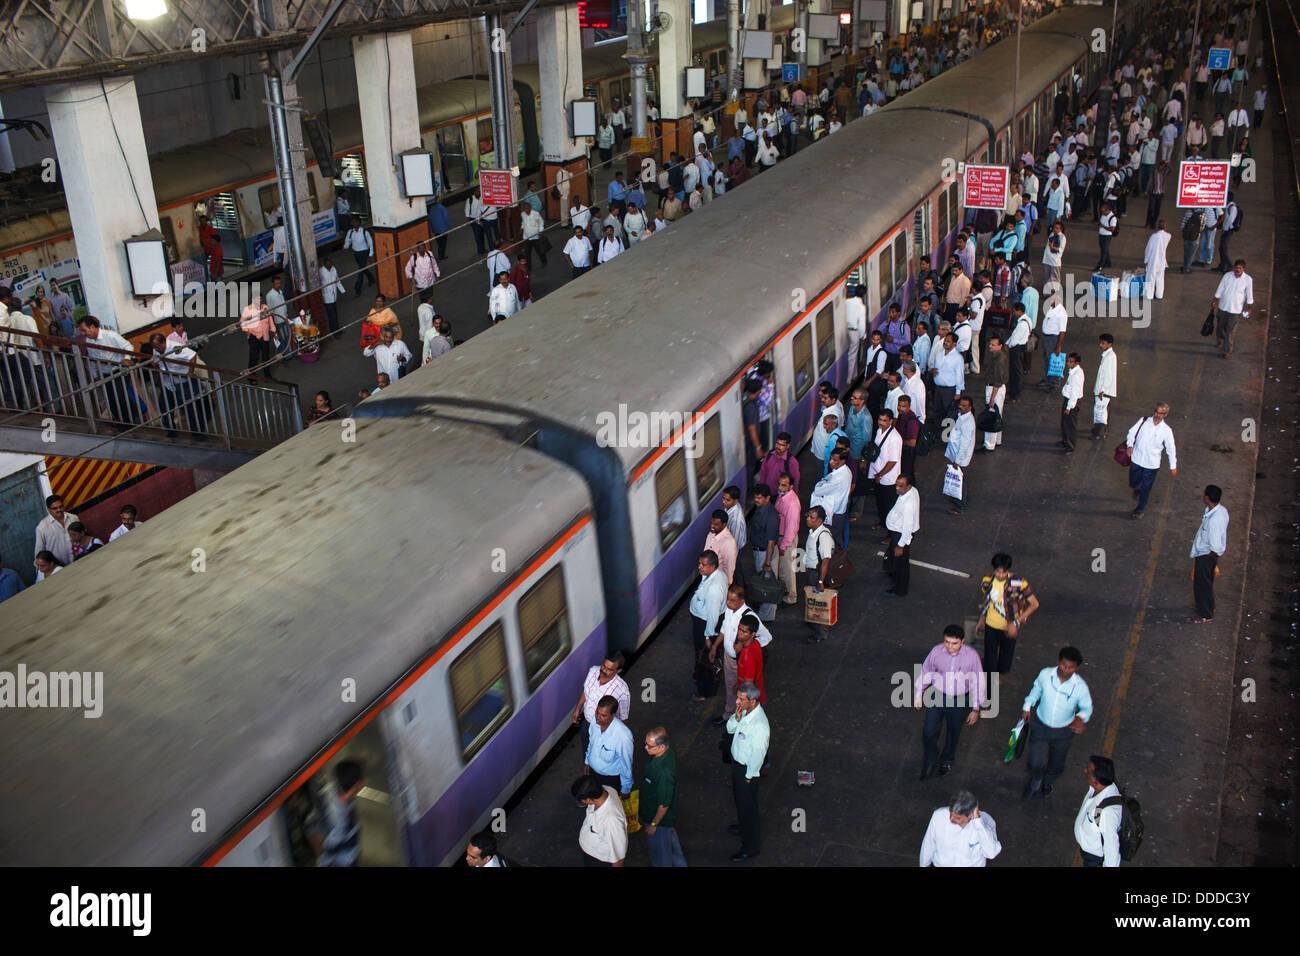 Passengers and trains at crowded Chhatrapati Shivaji Terminus (Victoria Terminus) railway station in Mumbai, India. - Stock Image